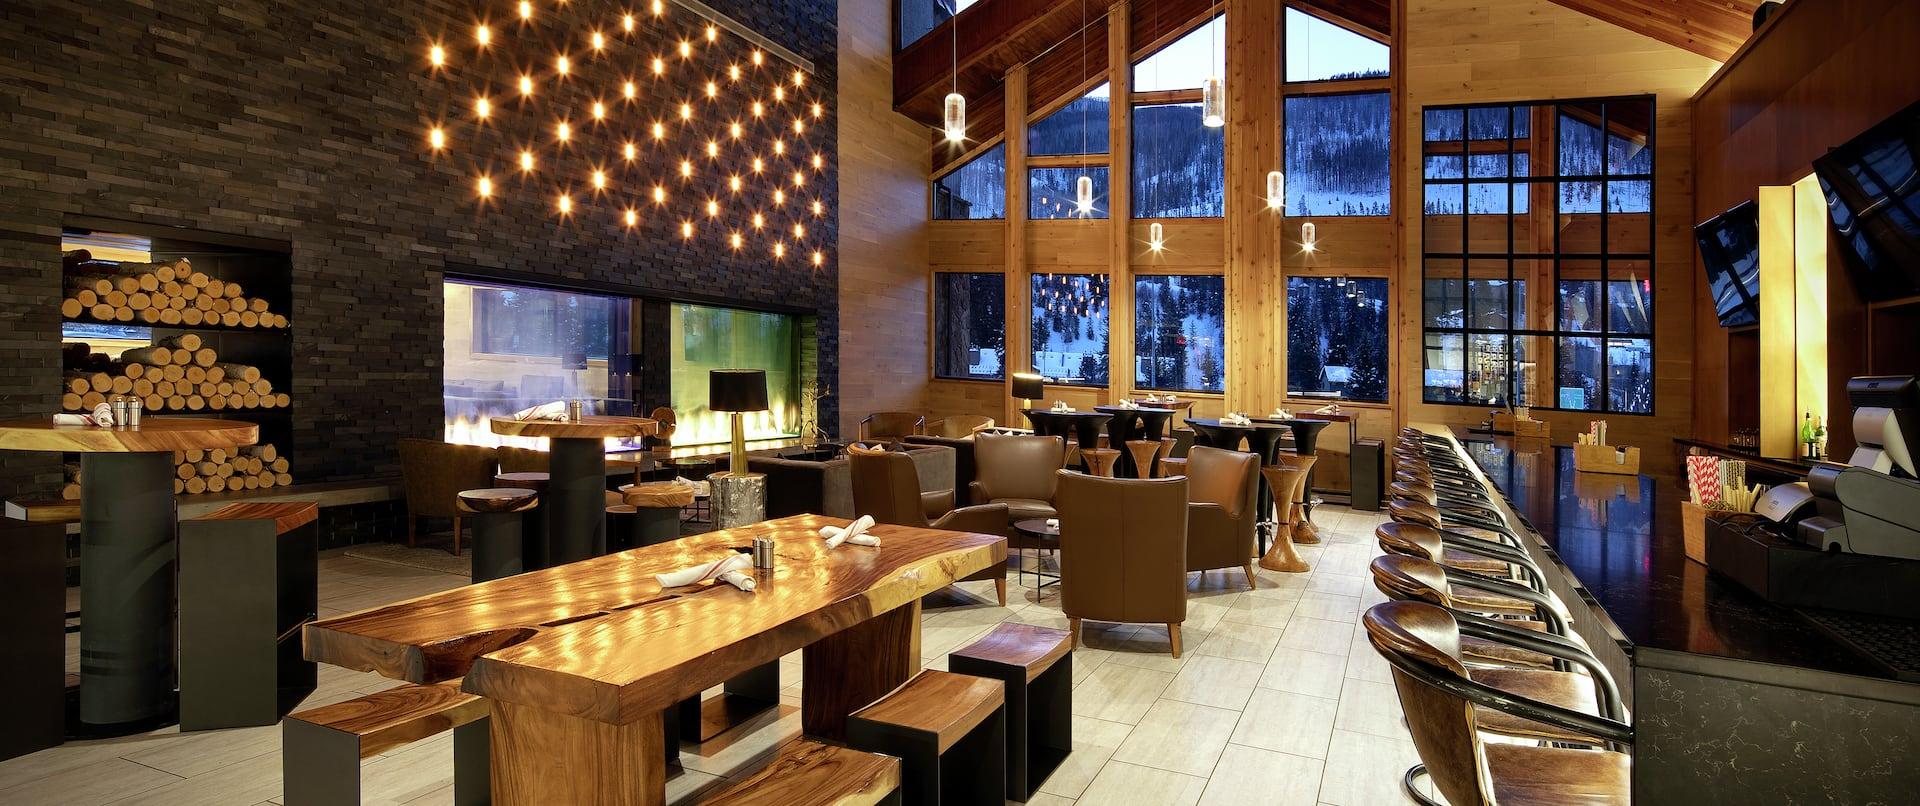 Pivot62 Restaurant And Bar